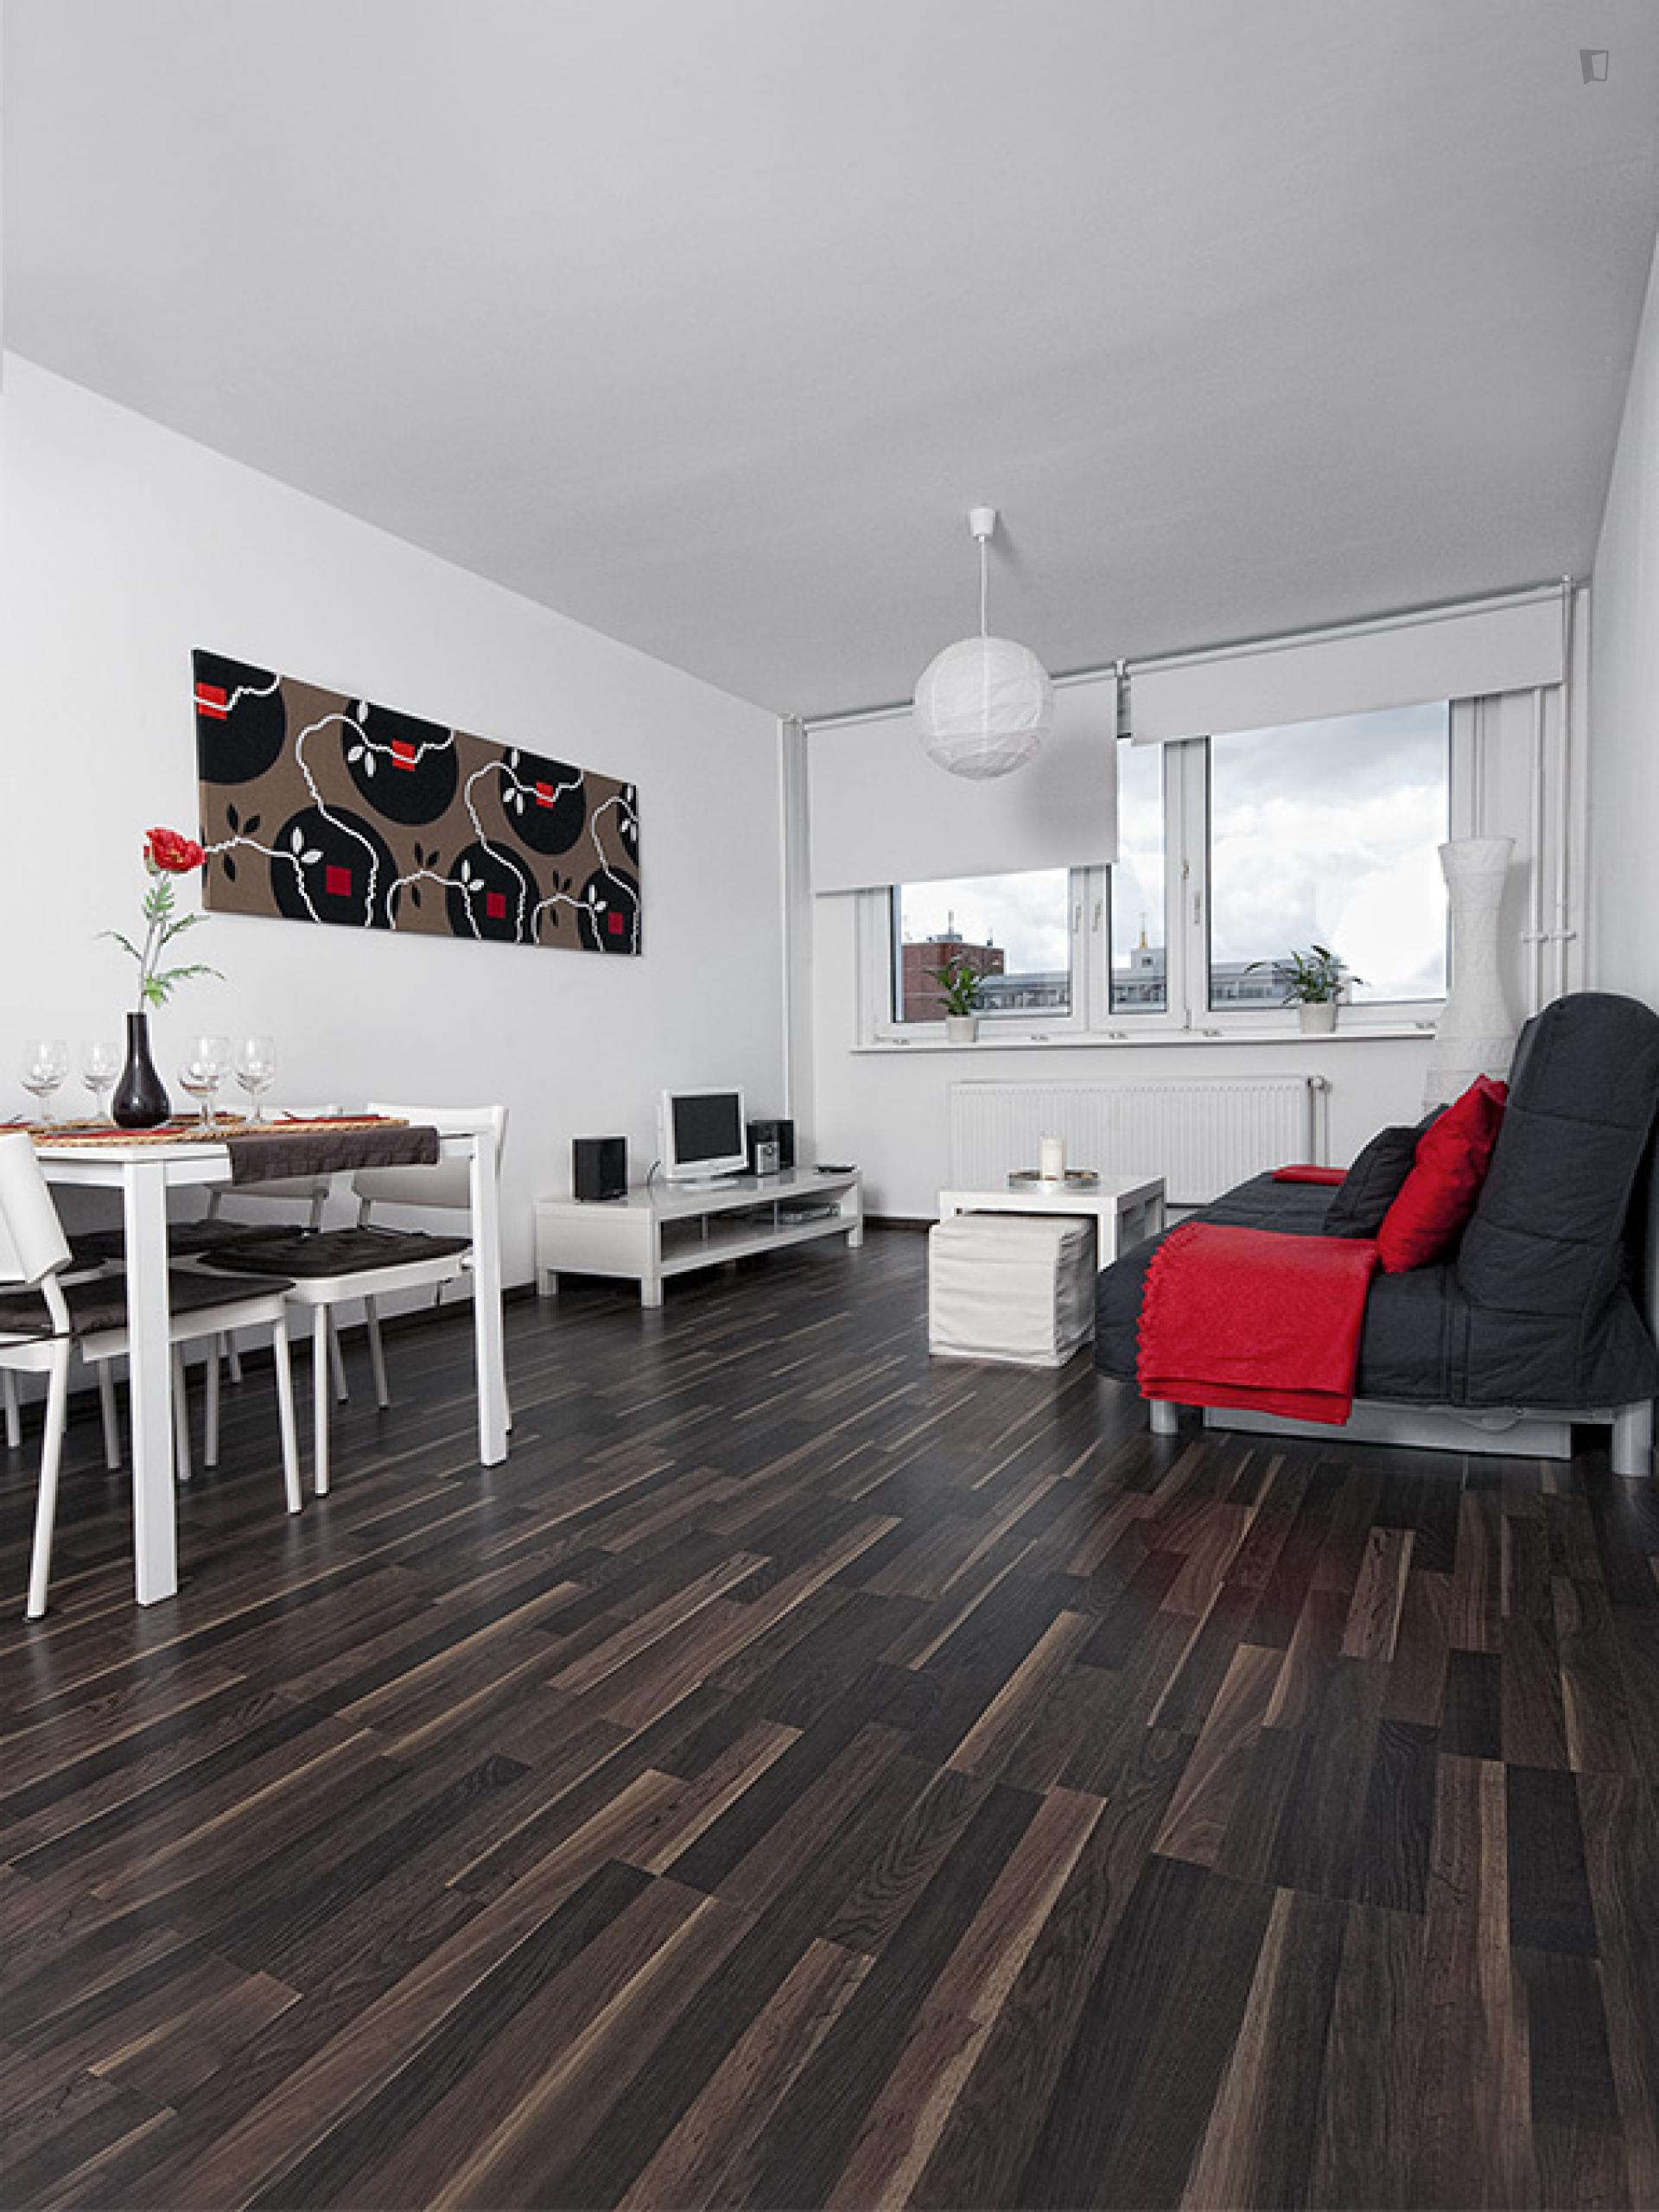 Roch 2 - Expat flat in Berlin city centre